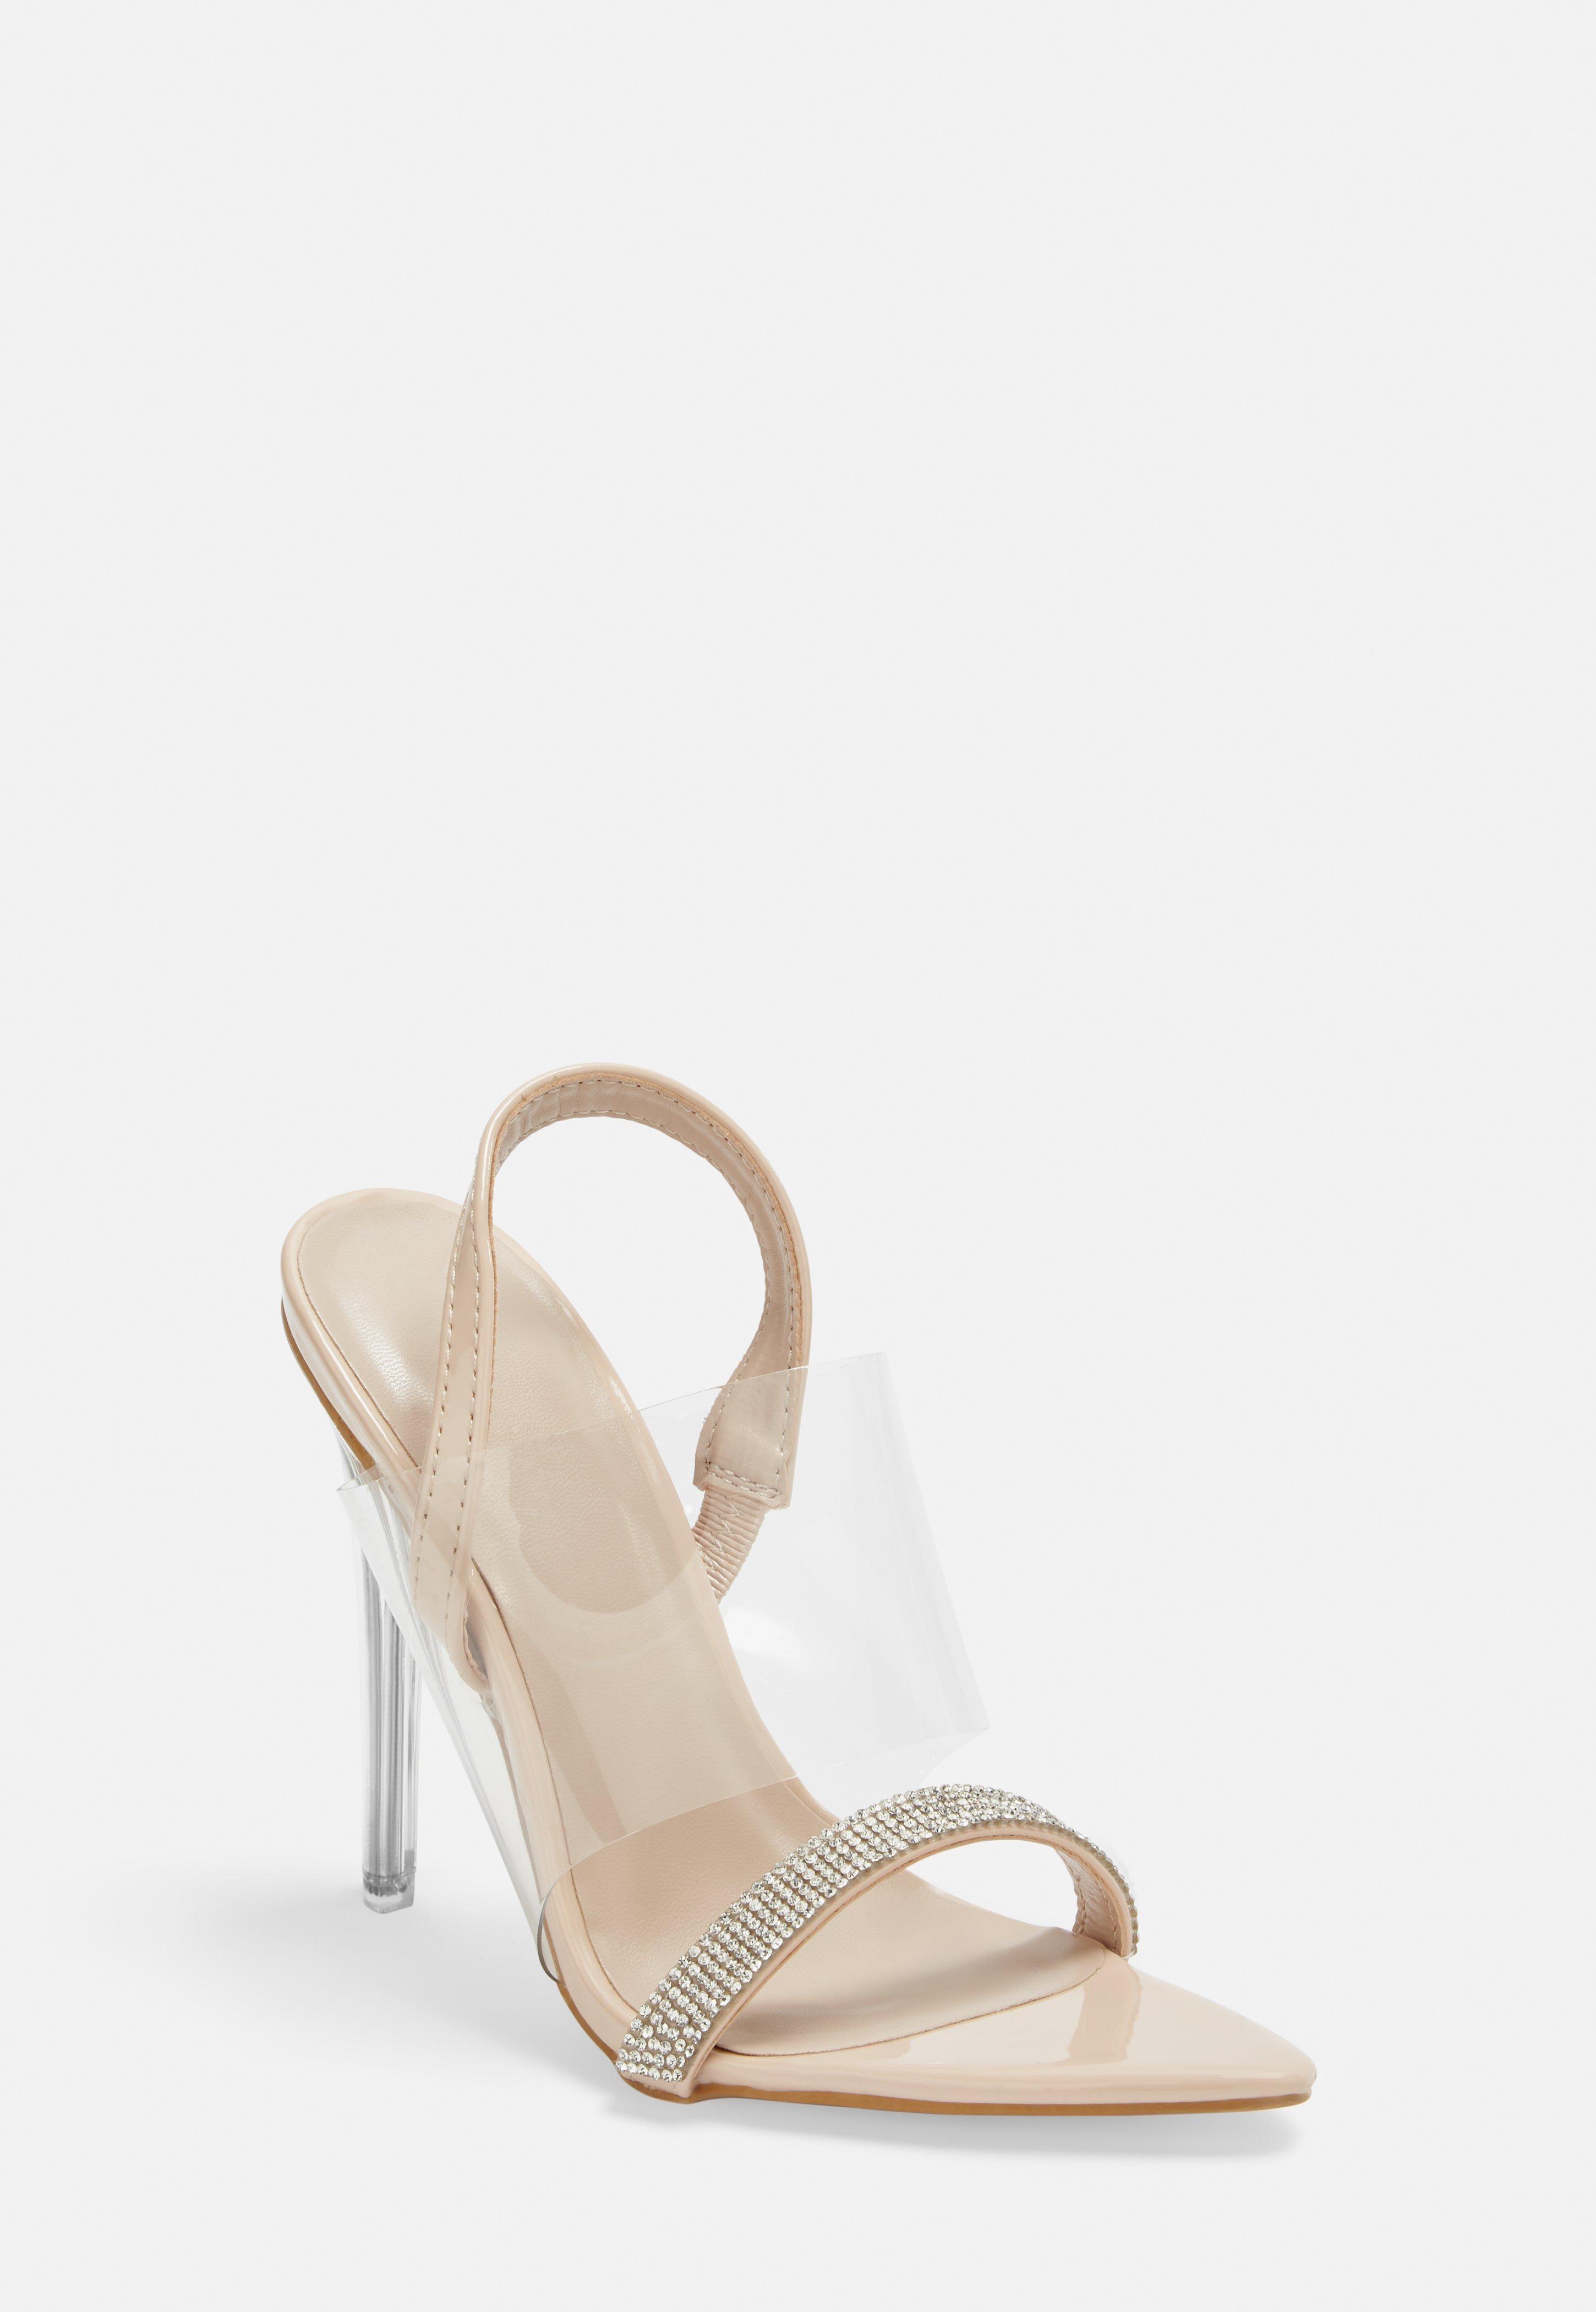 2abfed82e High Heels - Shop Women's Stilettos Online | Missguided